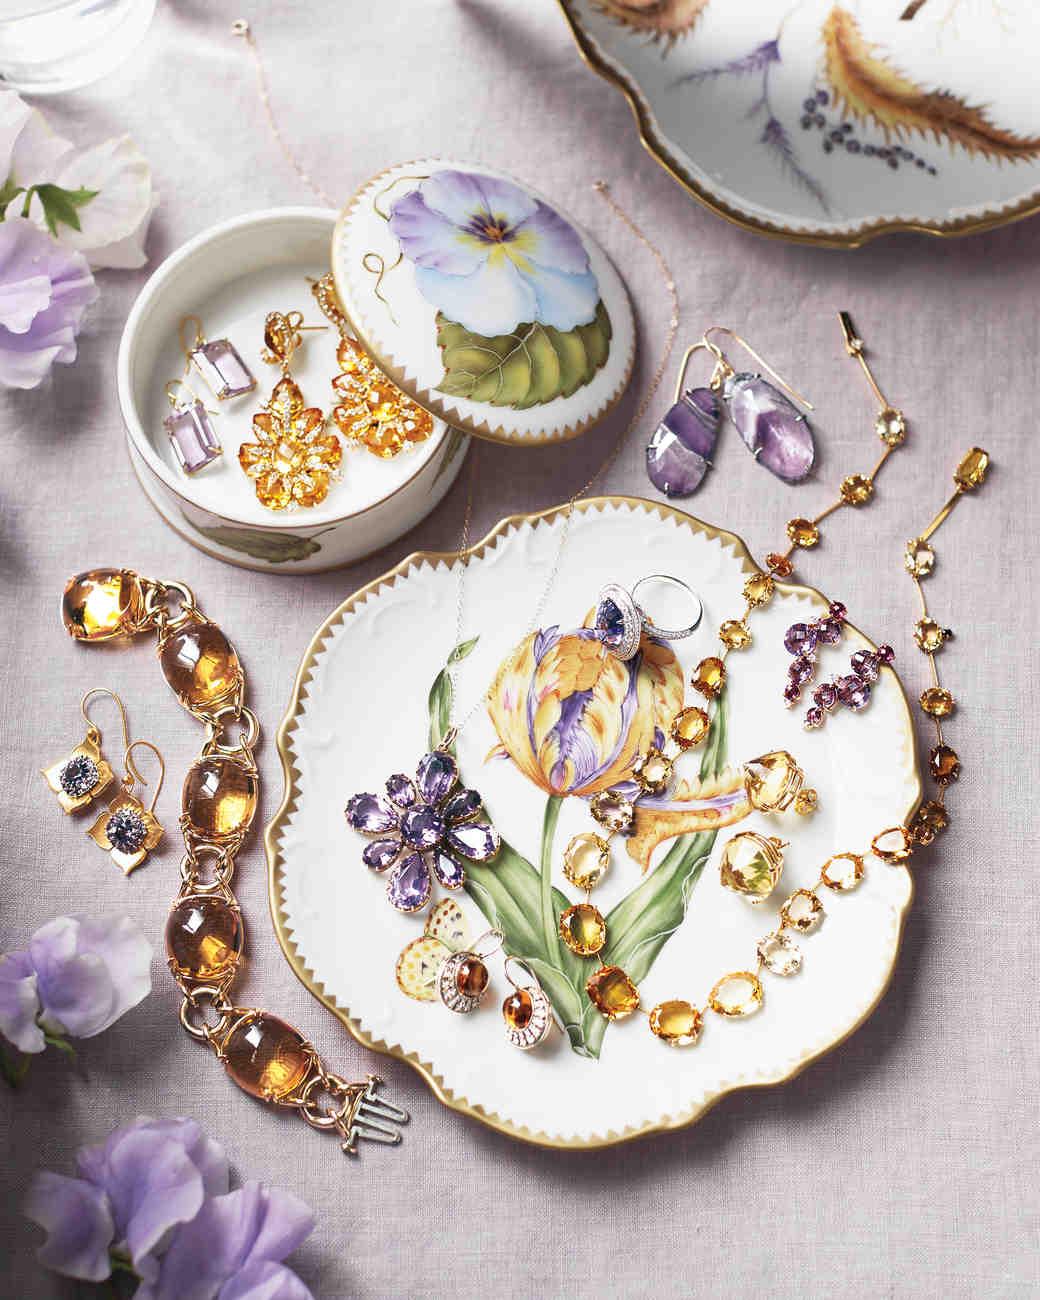 jewelry-sharper-046-mwd110998.jpg